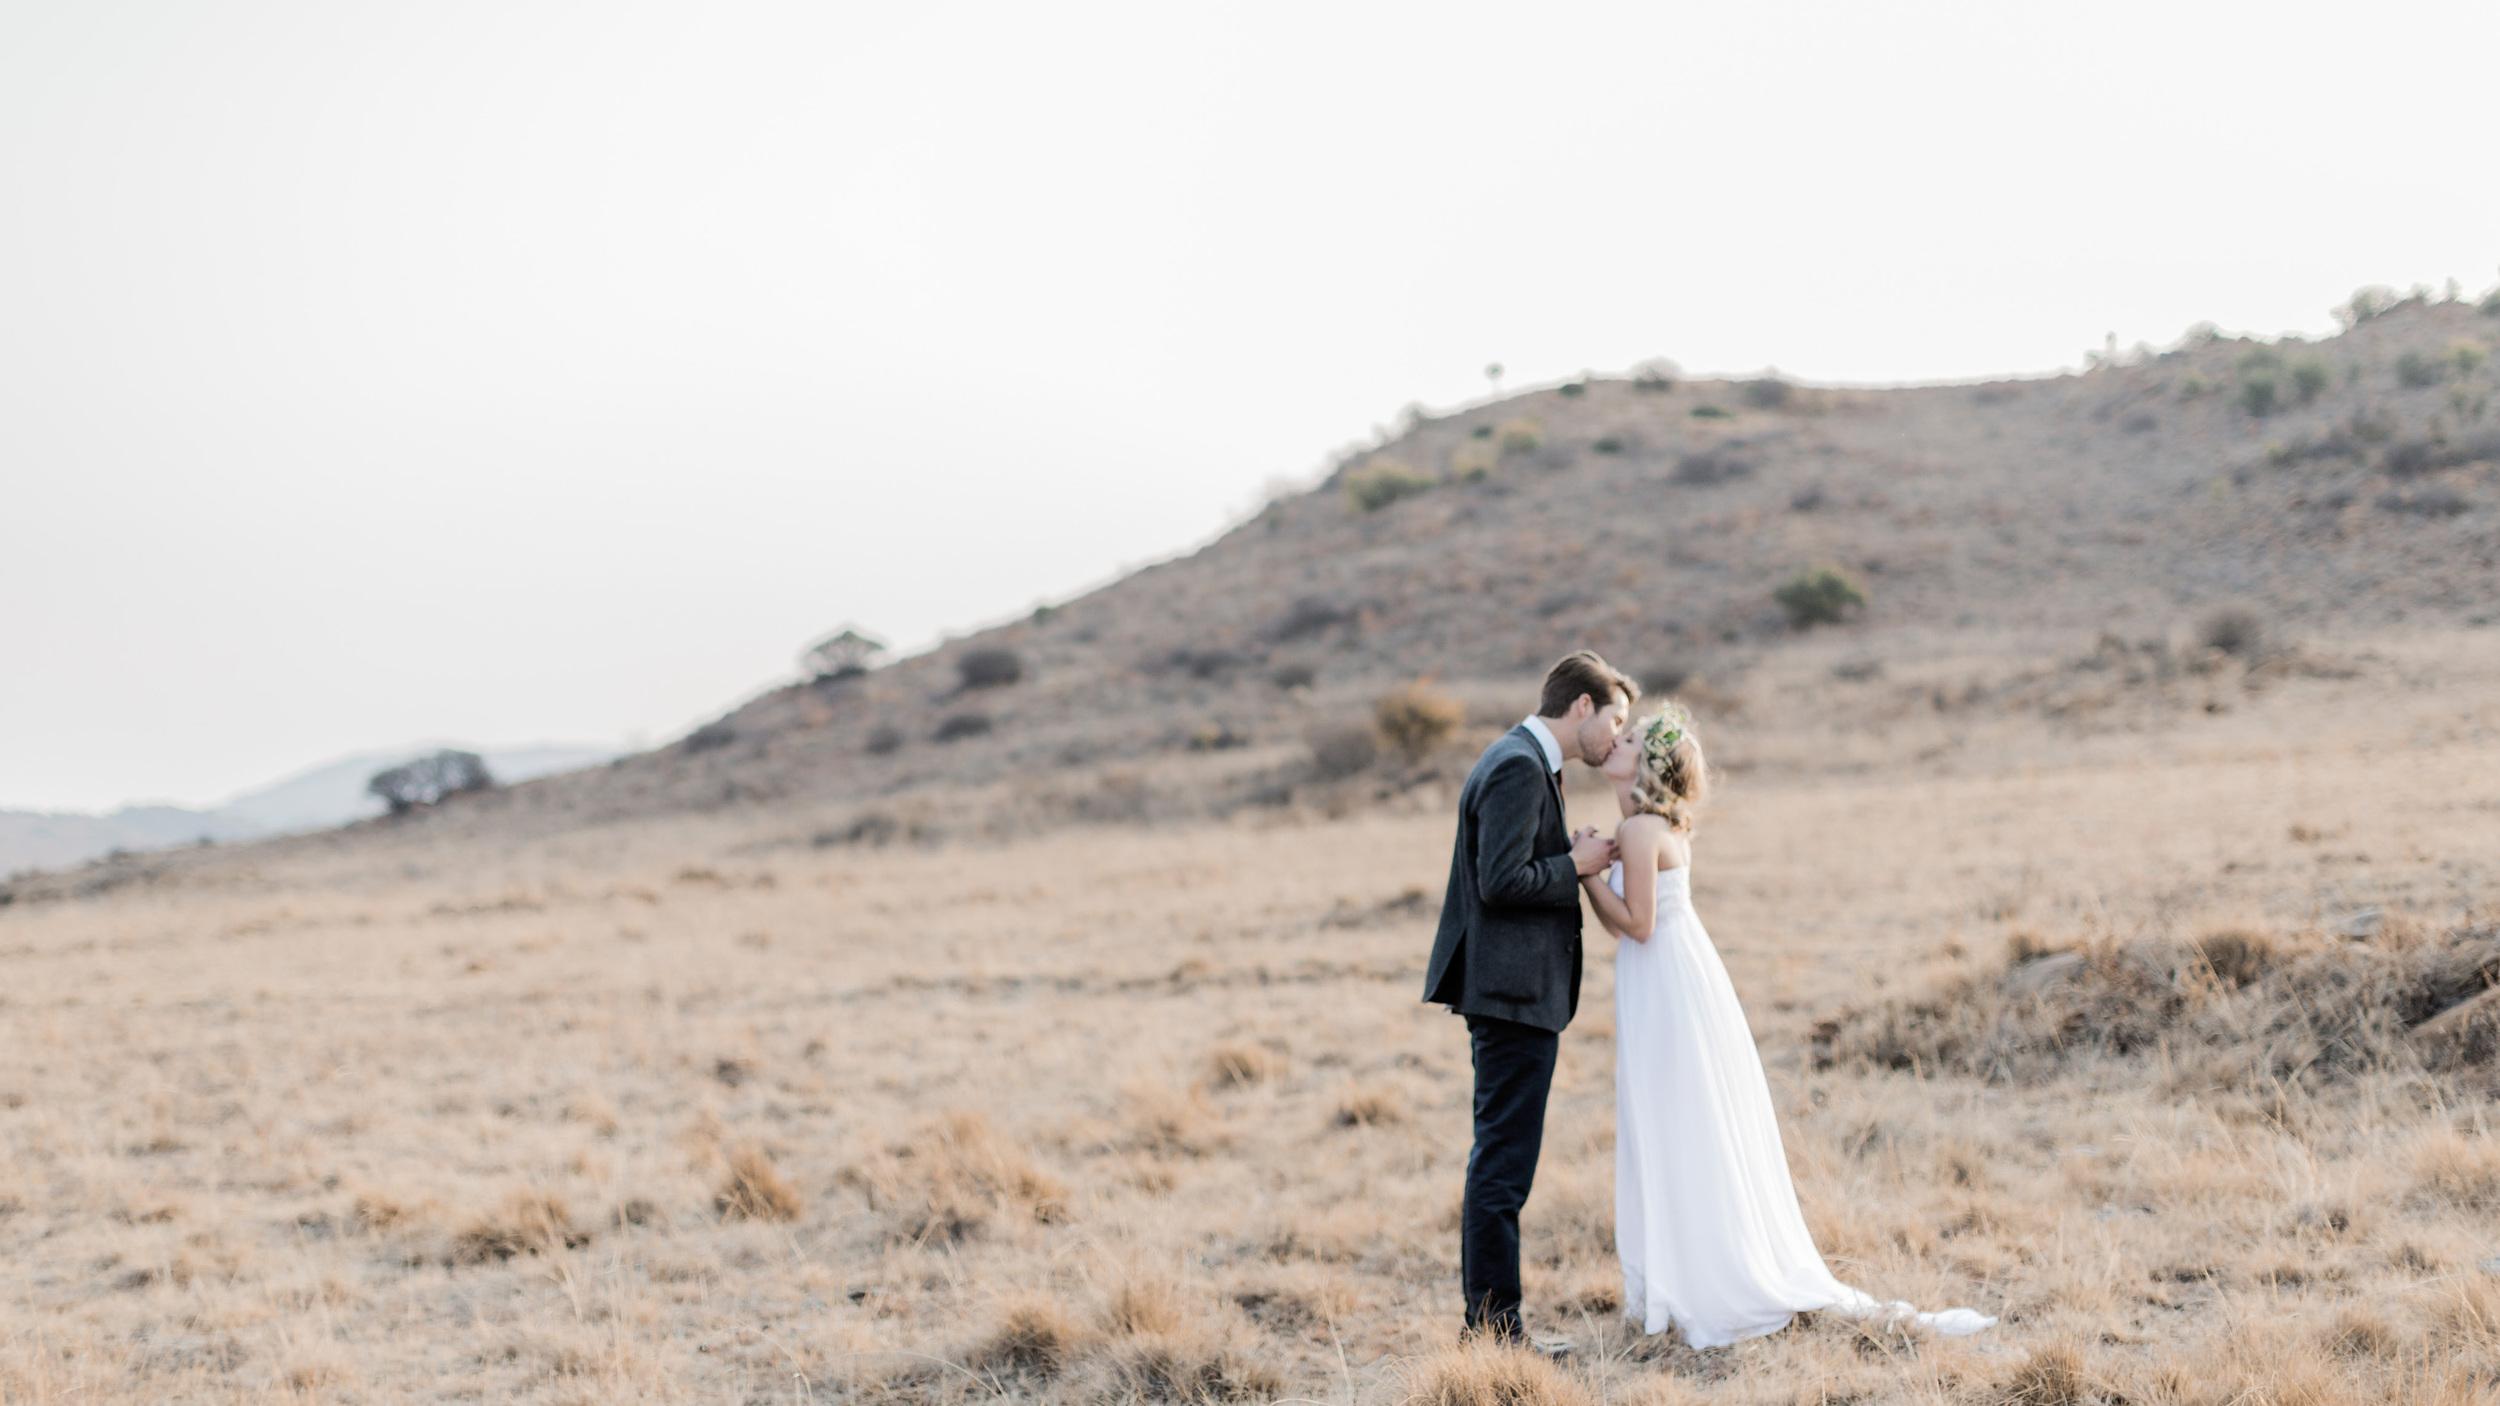 clareece smit wedding photographer based Gauteng South africa fine art